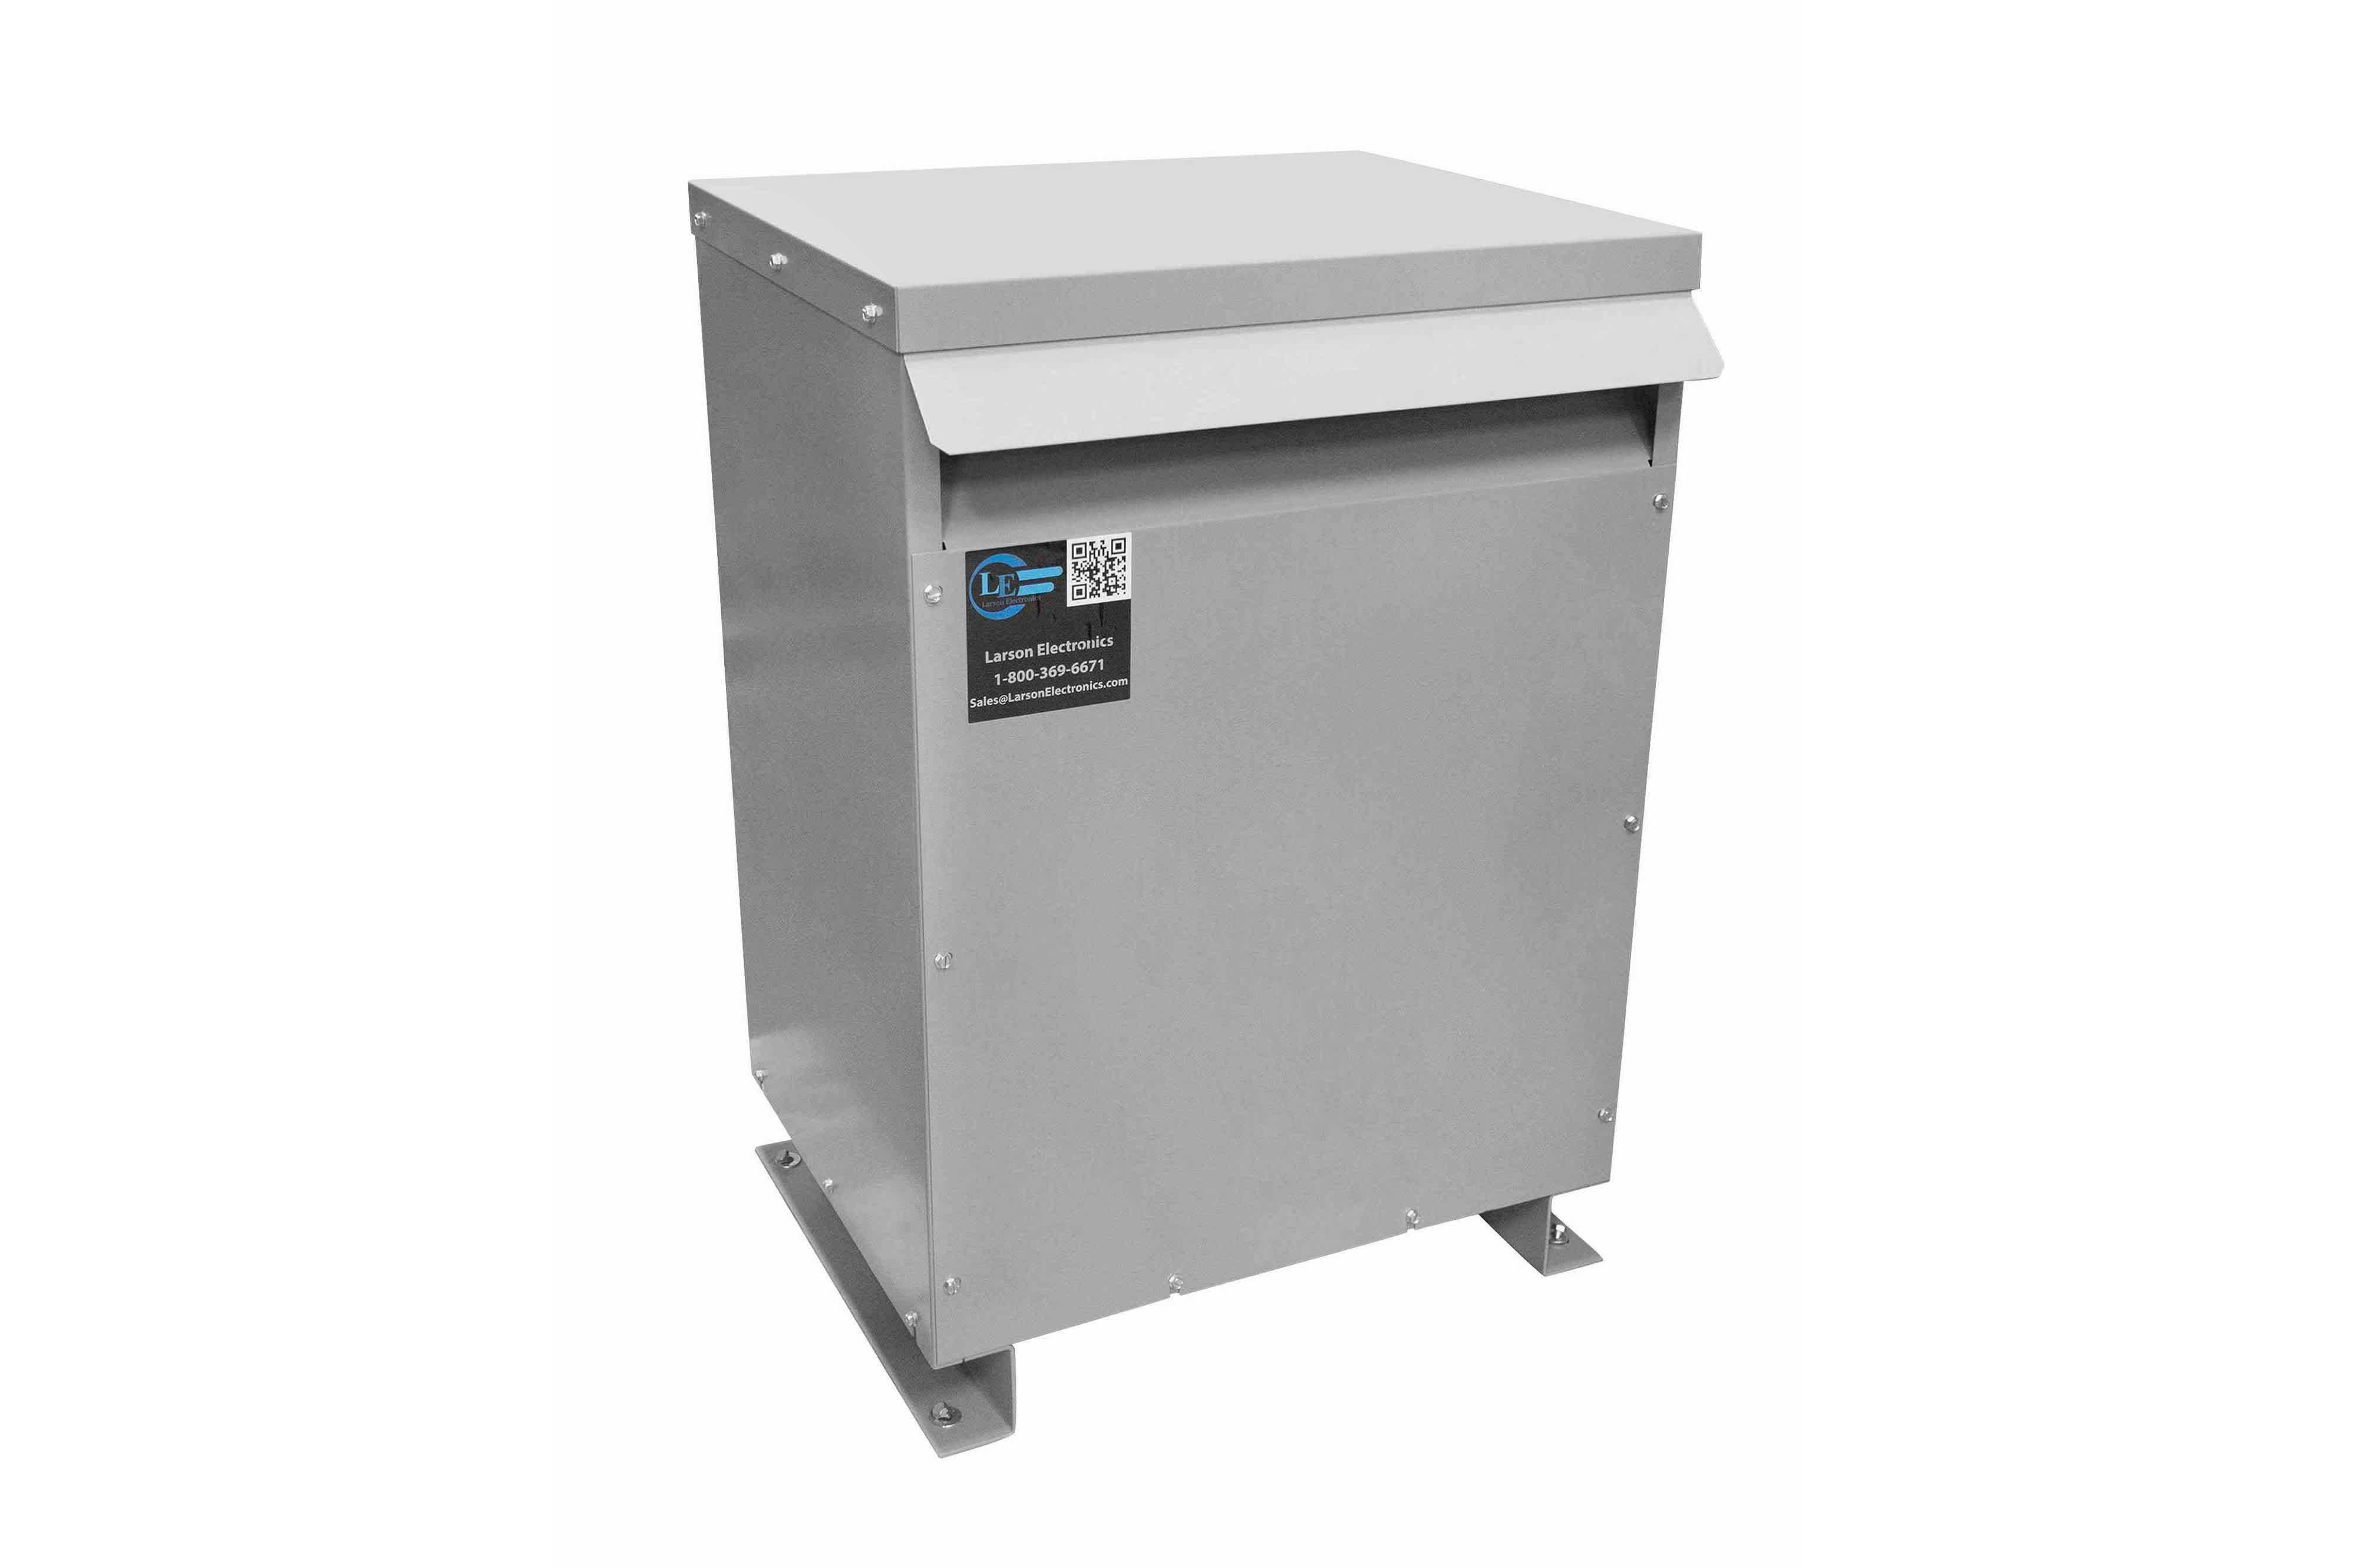 60 kVA 3PH Isolation Transformer, 575V Wye Primary, 480V Delta Secondary, N3R, Ventilated, 60 Hz